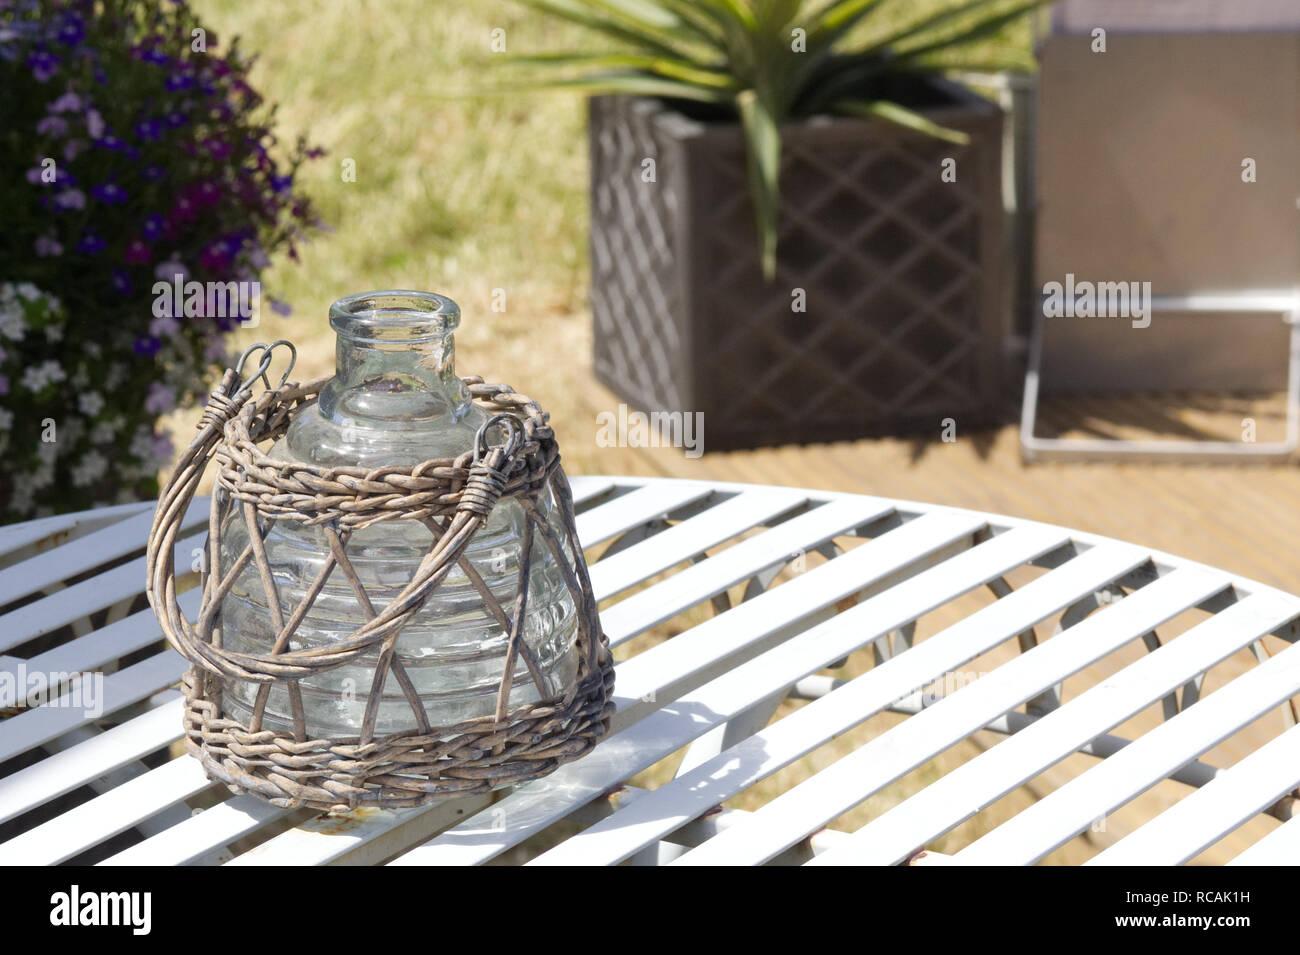 Portacandele Da Giardino : Portacandele in vetro immagini & portacandele in vetro fotos stock